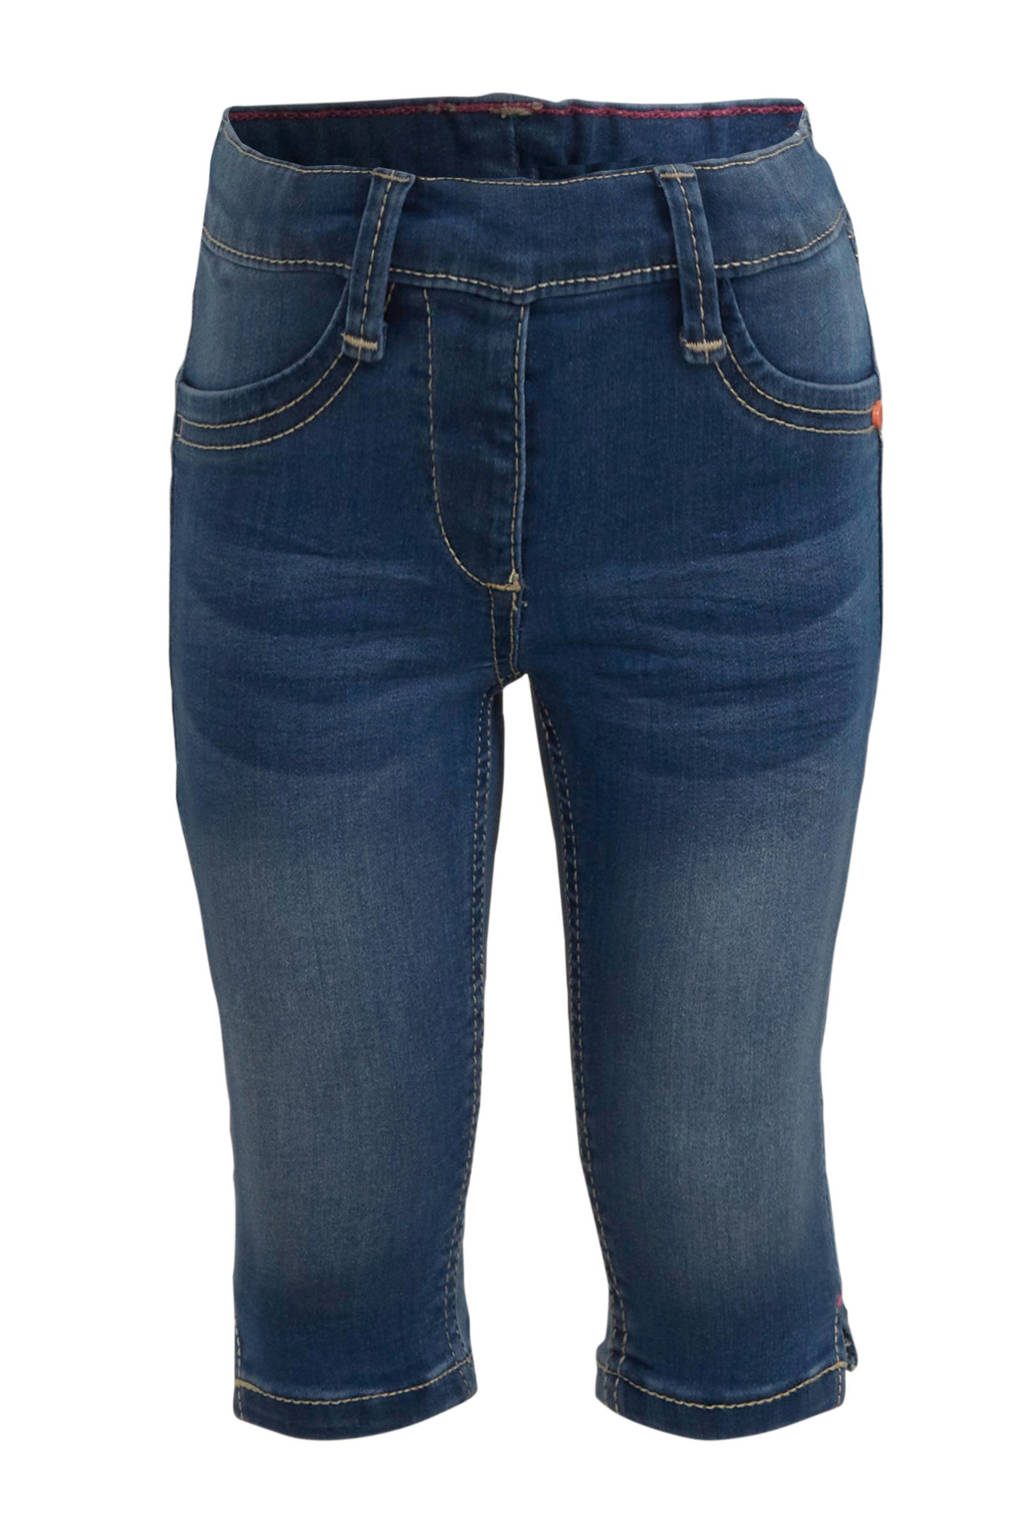 s.Oliver slim fit jeans stonewashed, Stonewashed